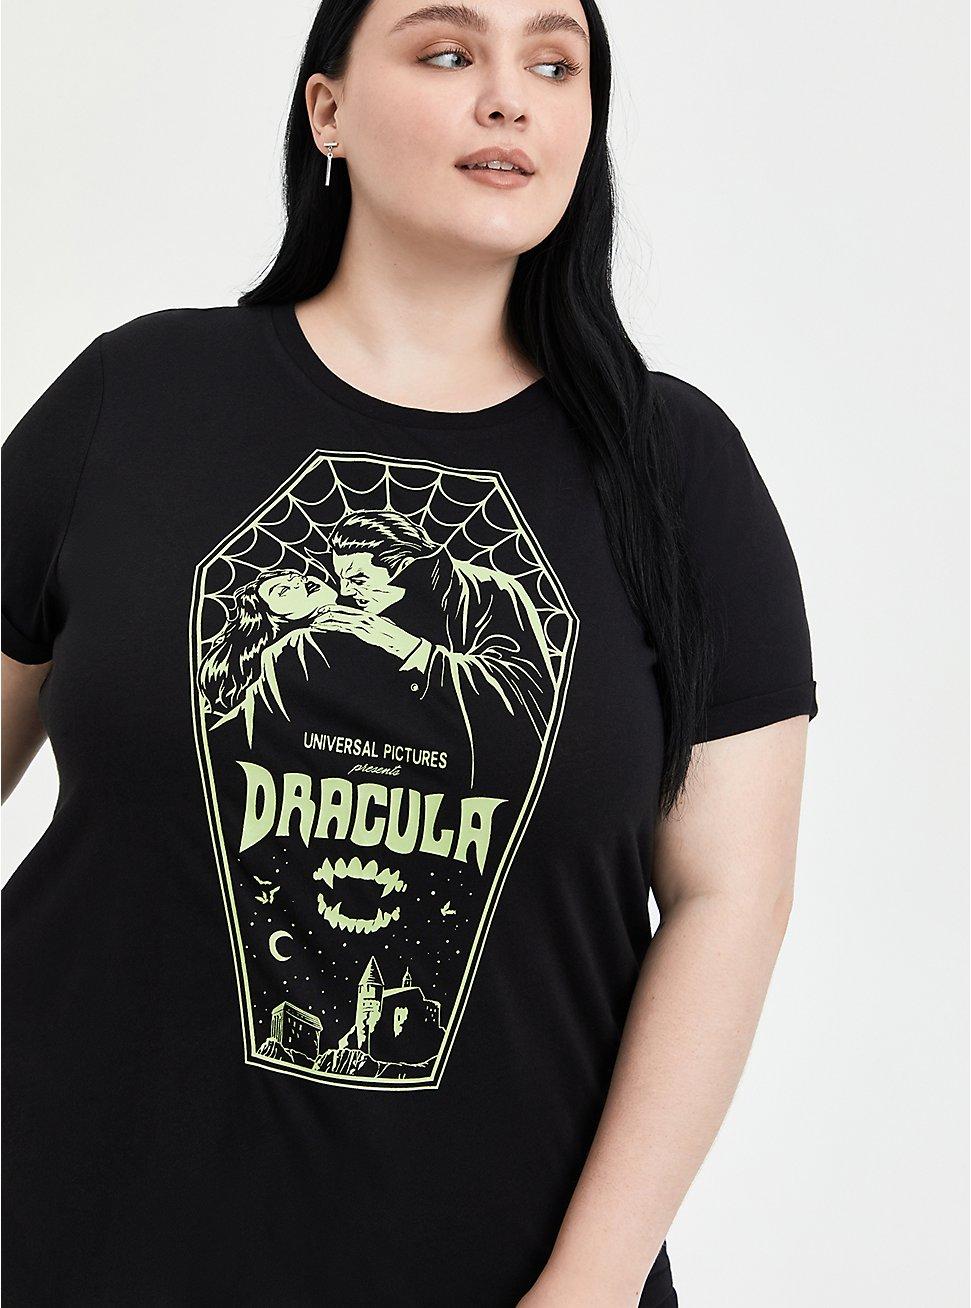 Universal Monsters Dracula Coffin Glow Top - Black, DEEP BLACK, hi-res